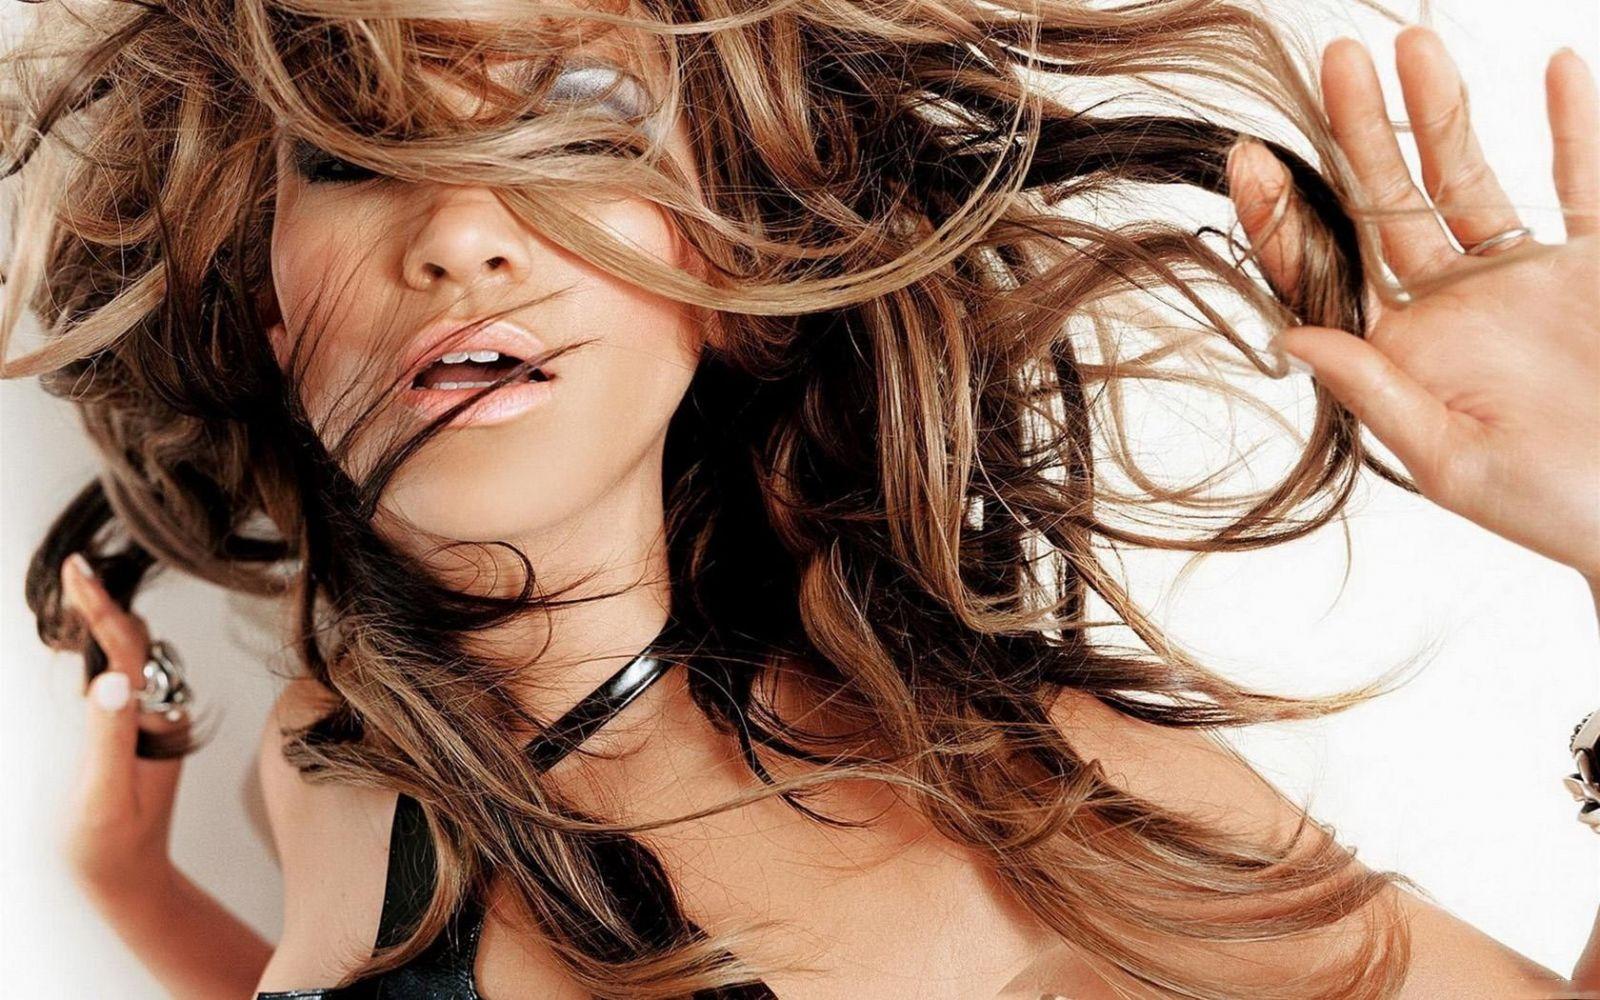 Дженнифер Лопес - фото №2